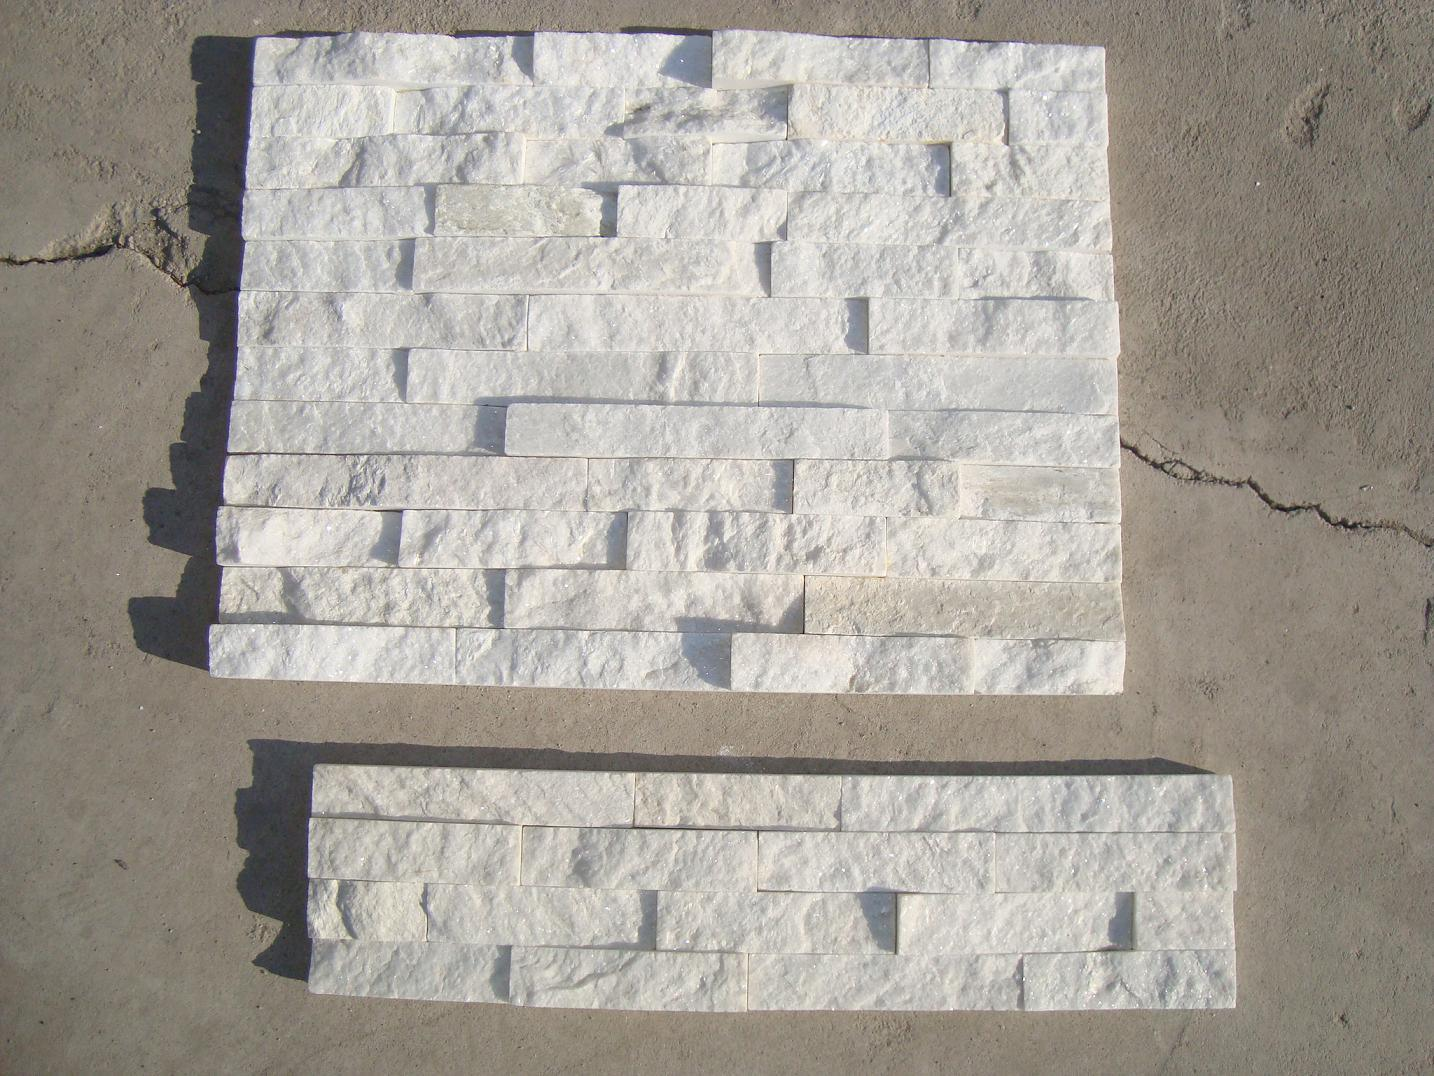 Pietre Bianca Per Interni [hot item] pietra della coltura della bramma, pietra bianca della bramma